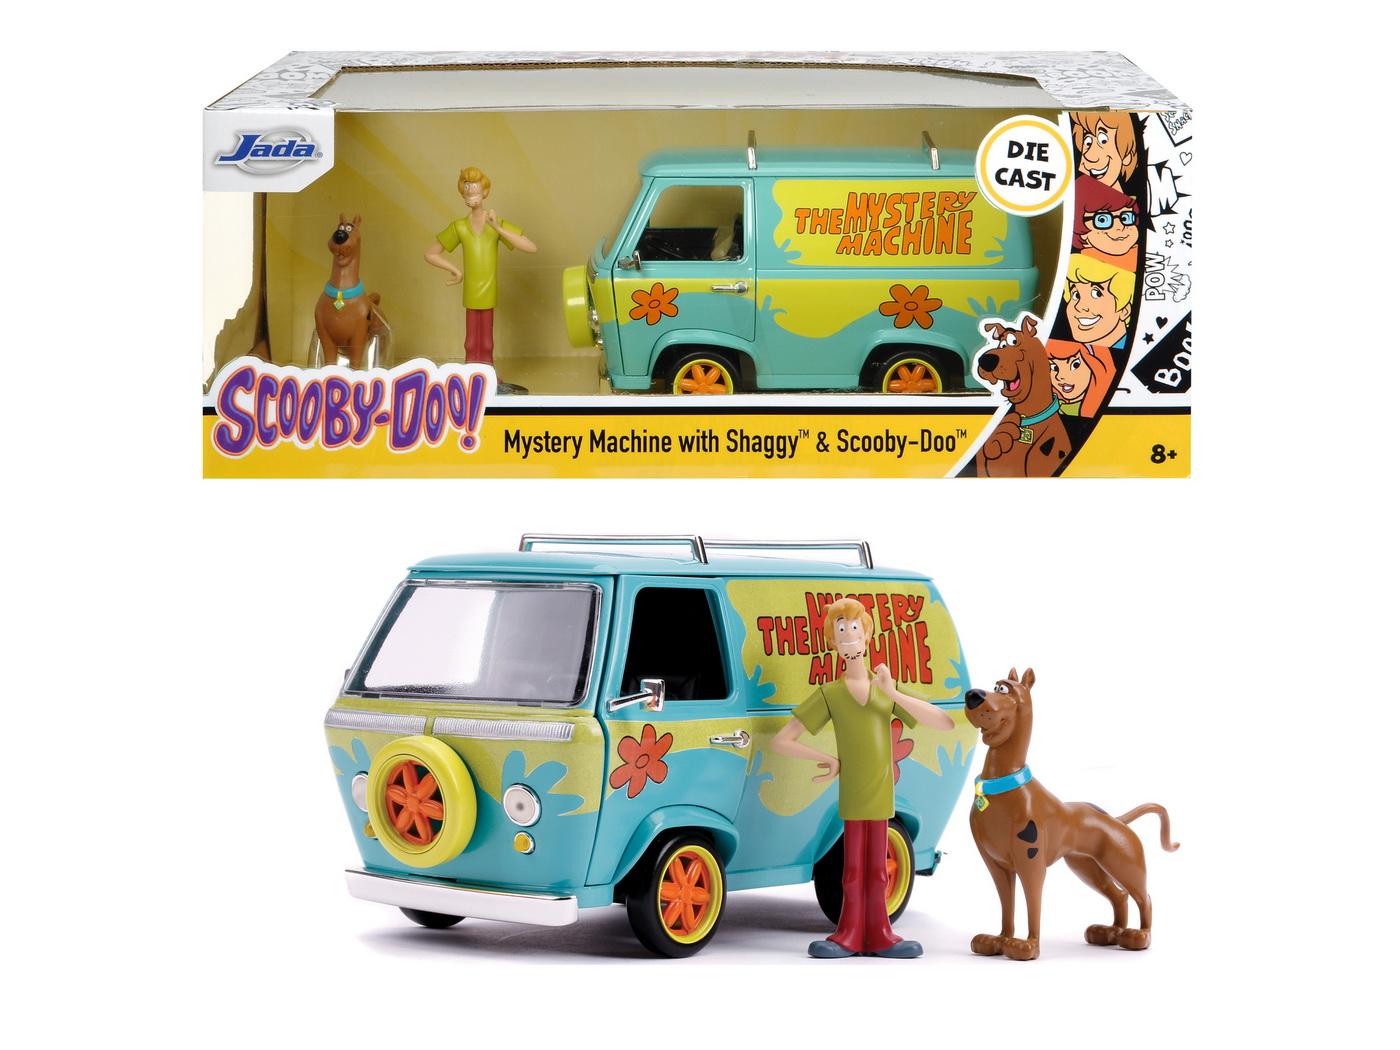 Scooby Doo Mystery Van Set Format Din Dubita Metalica Scara 1:24 Si 2 Figurine Scooby Doo Si Shaggy